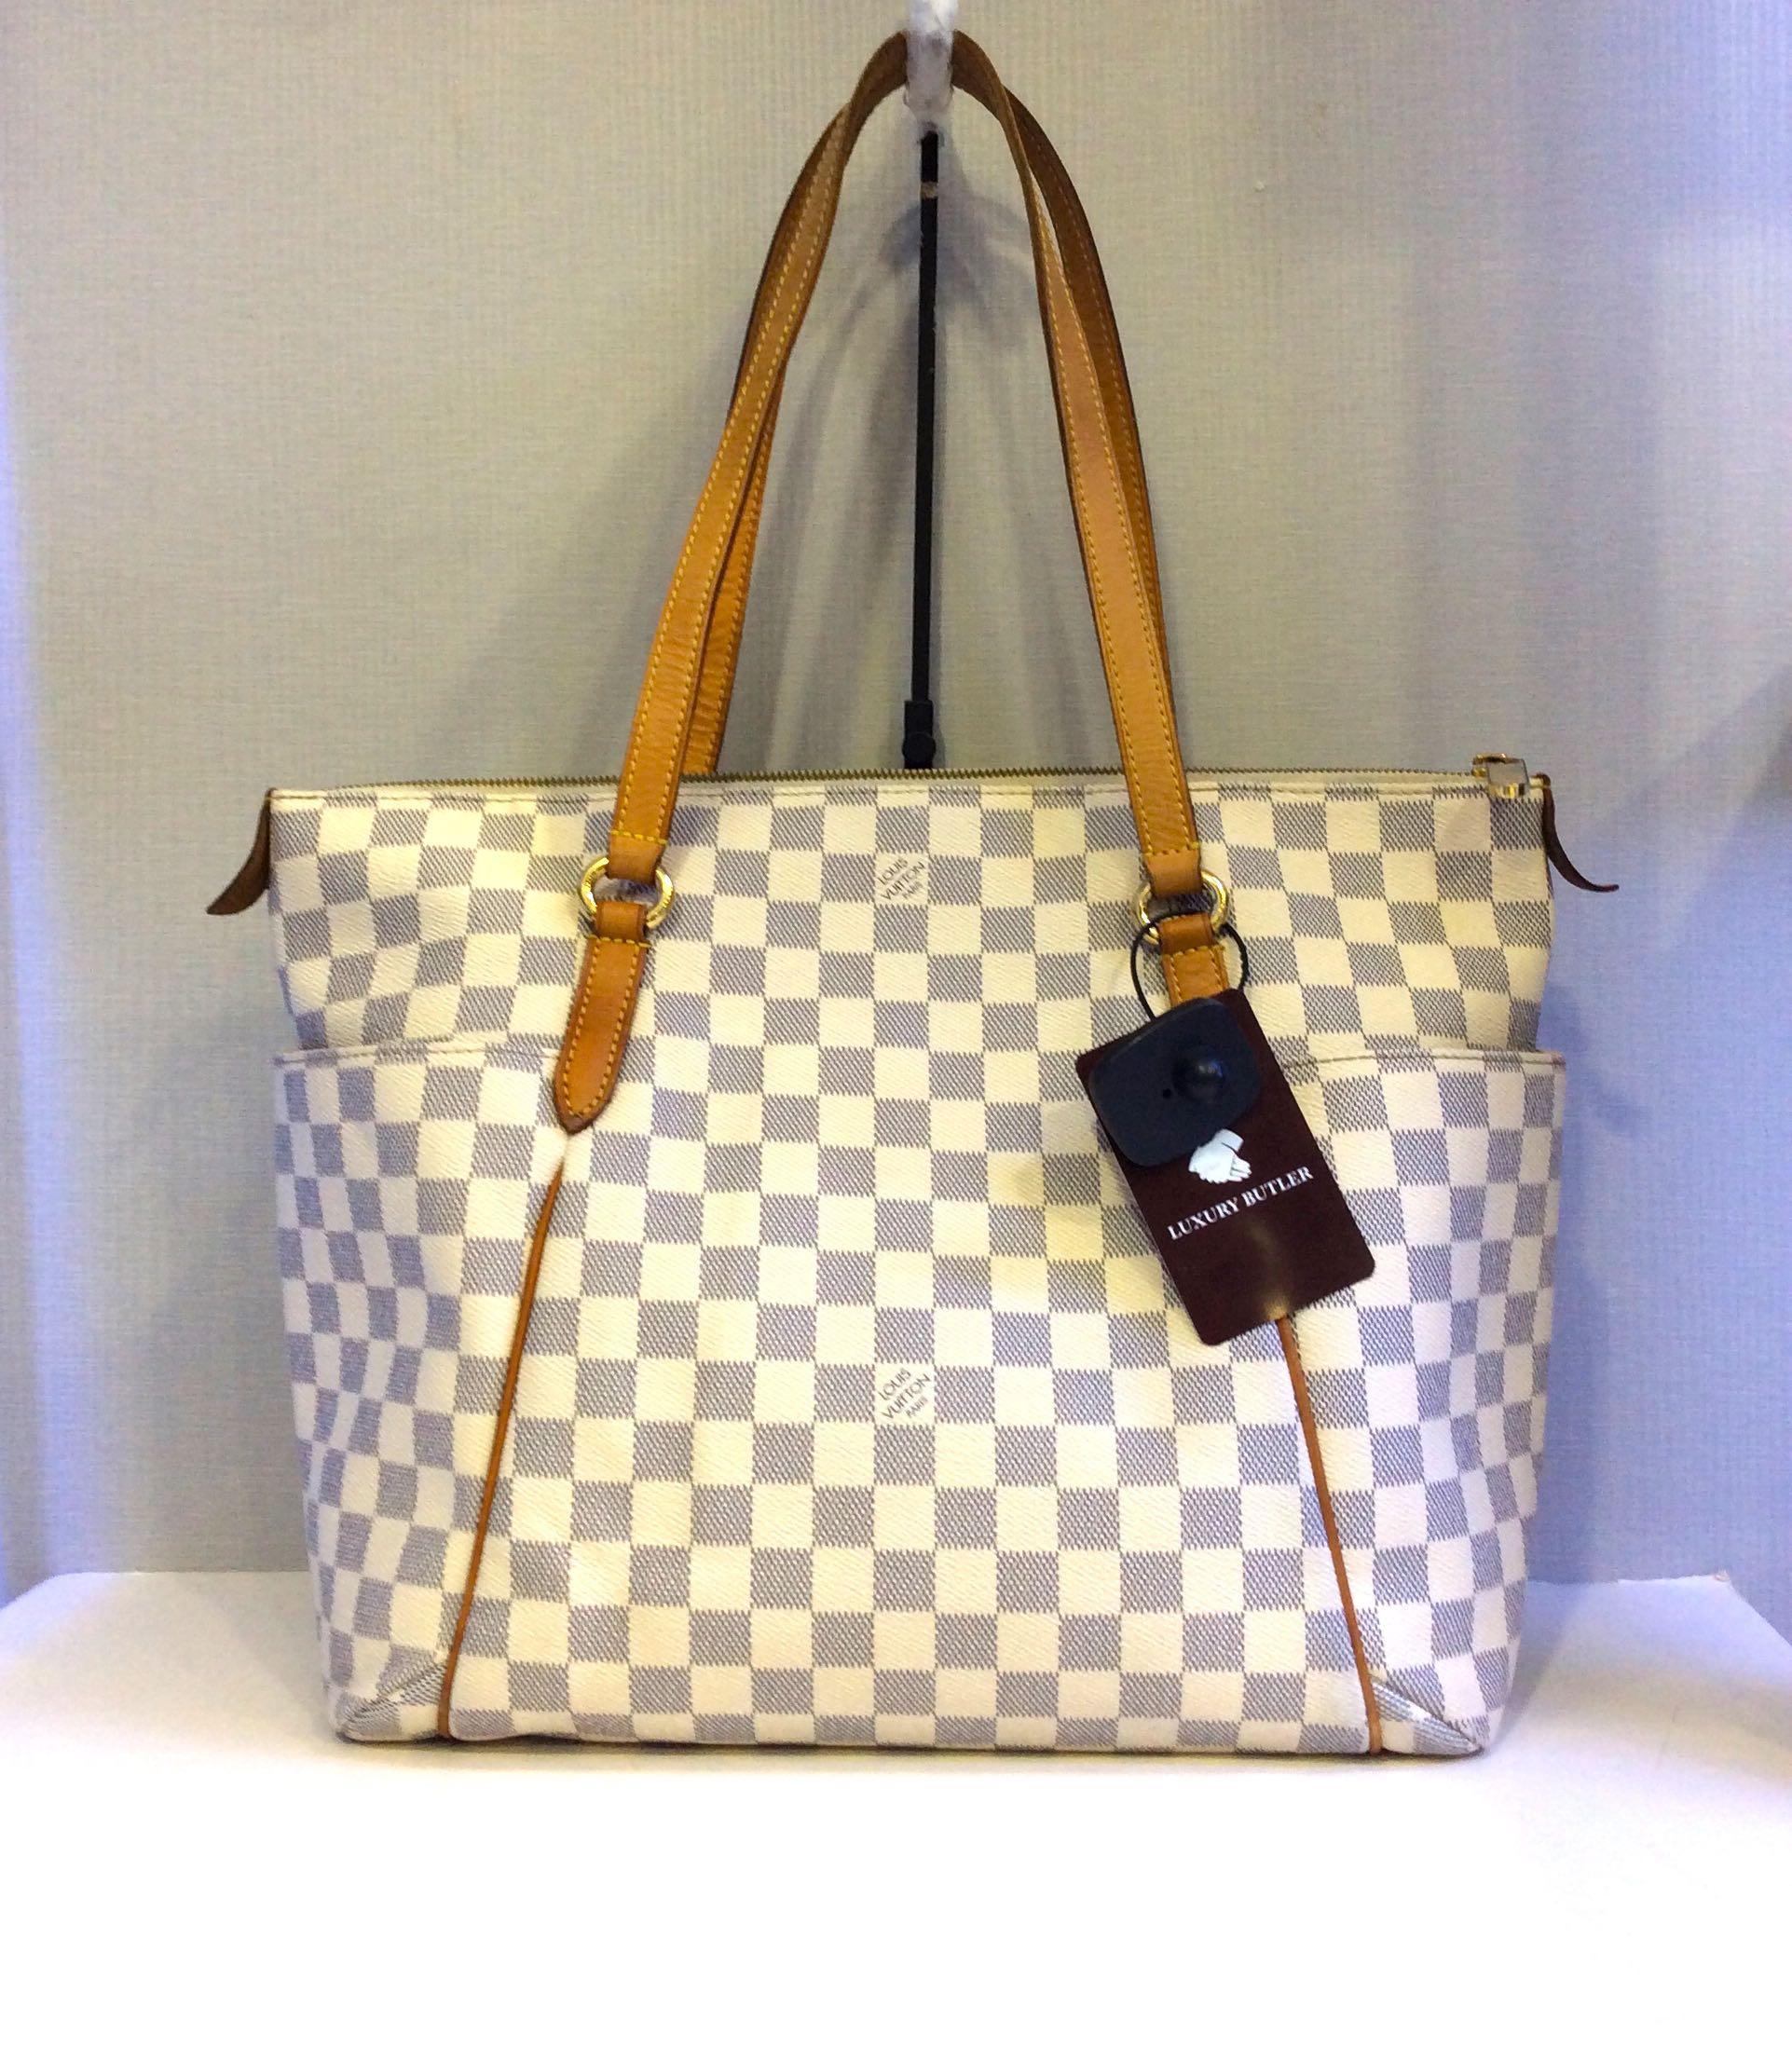 67a986b6f Preloved Louis Vuitton ShoulderBag, Women's Fashion, Bags & Wallets ...